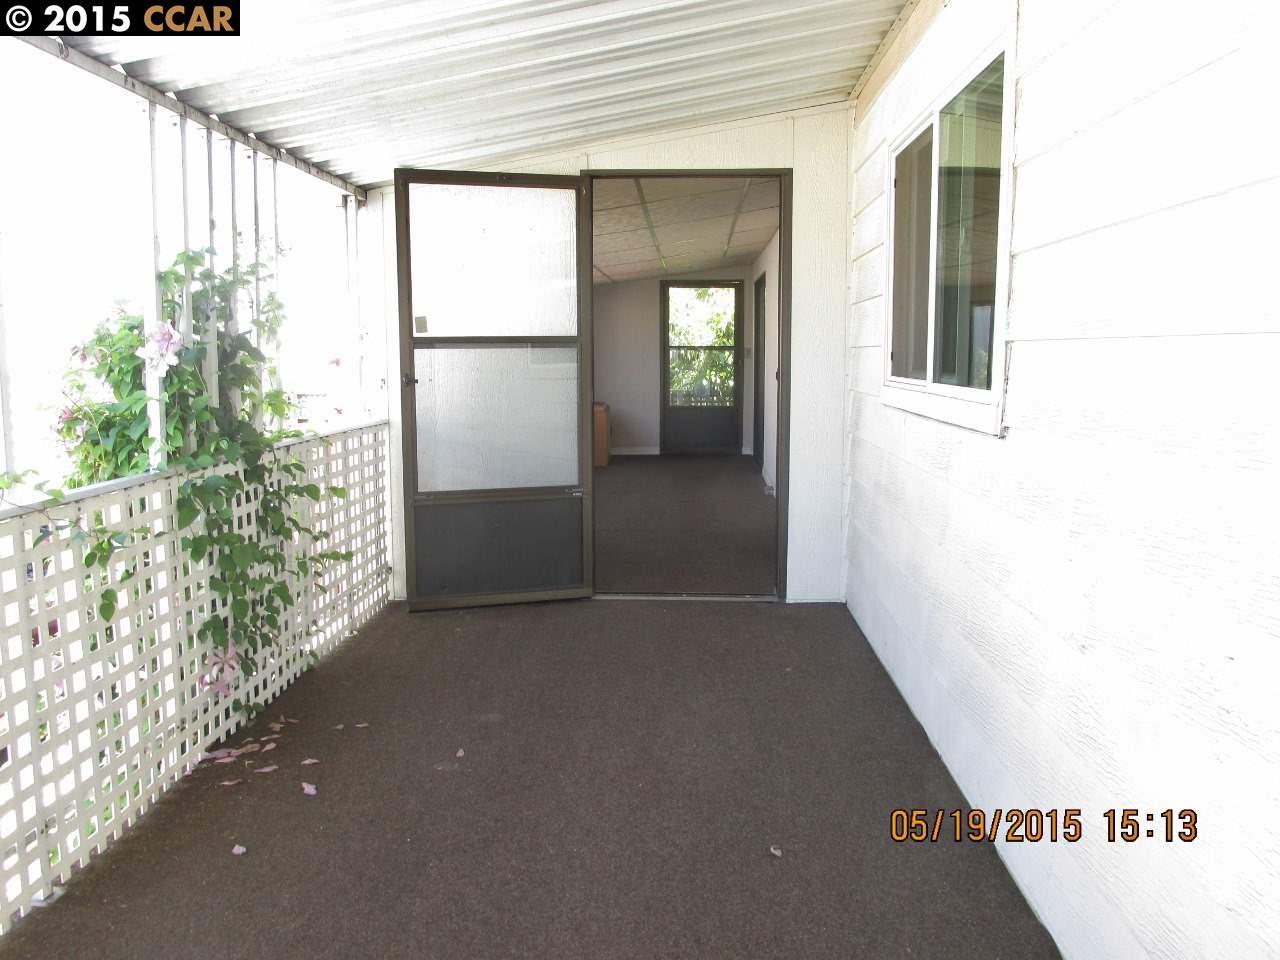 Additional photo for property listing at 385 Avenida Flores  Pacheco, Kalifornien 94553 Vereinigte Staaten